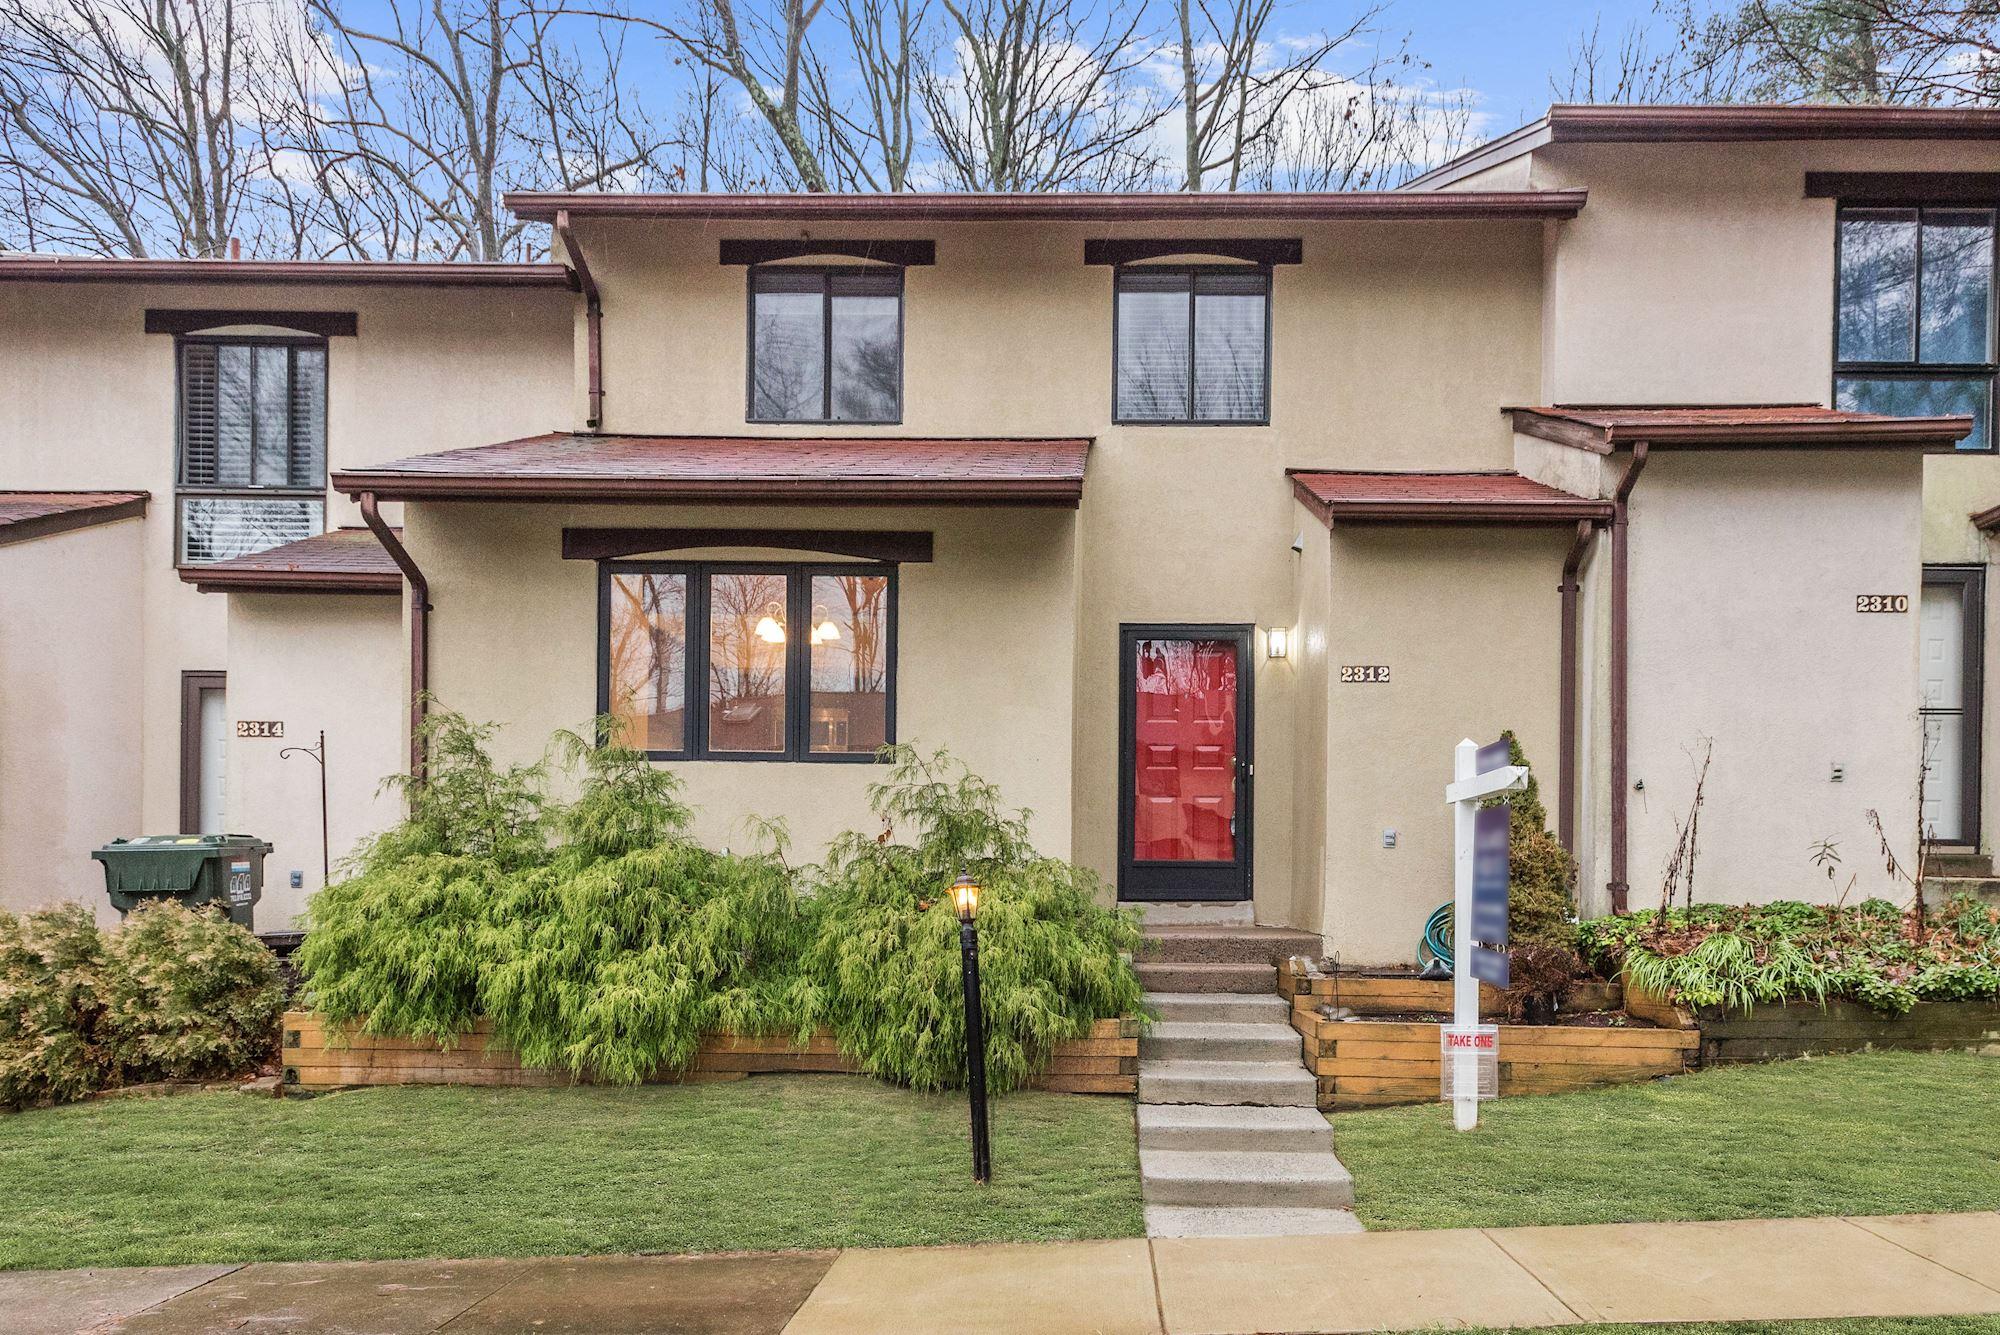 NEW LISTING: 3 BD RenovatedContemporary Home in Reston, VA